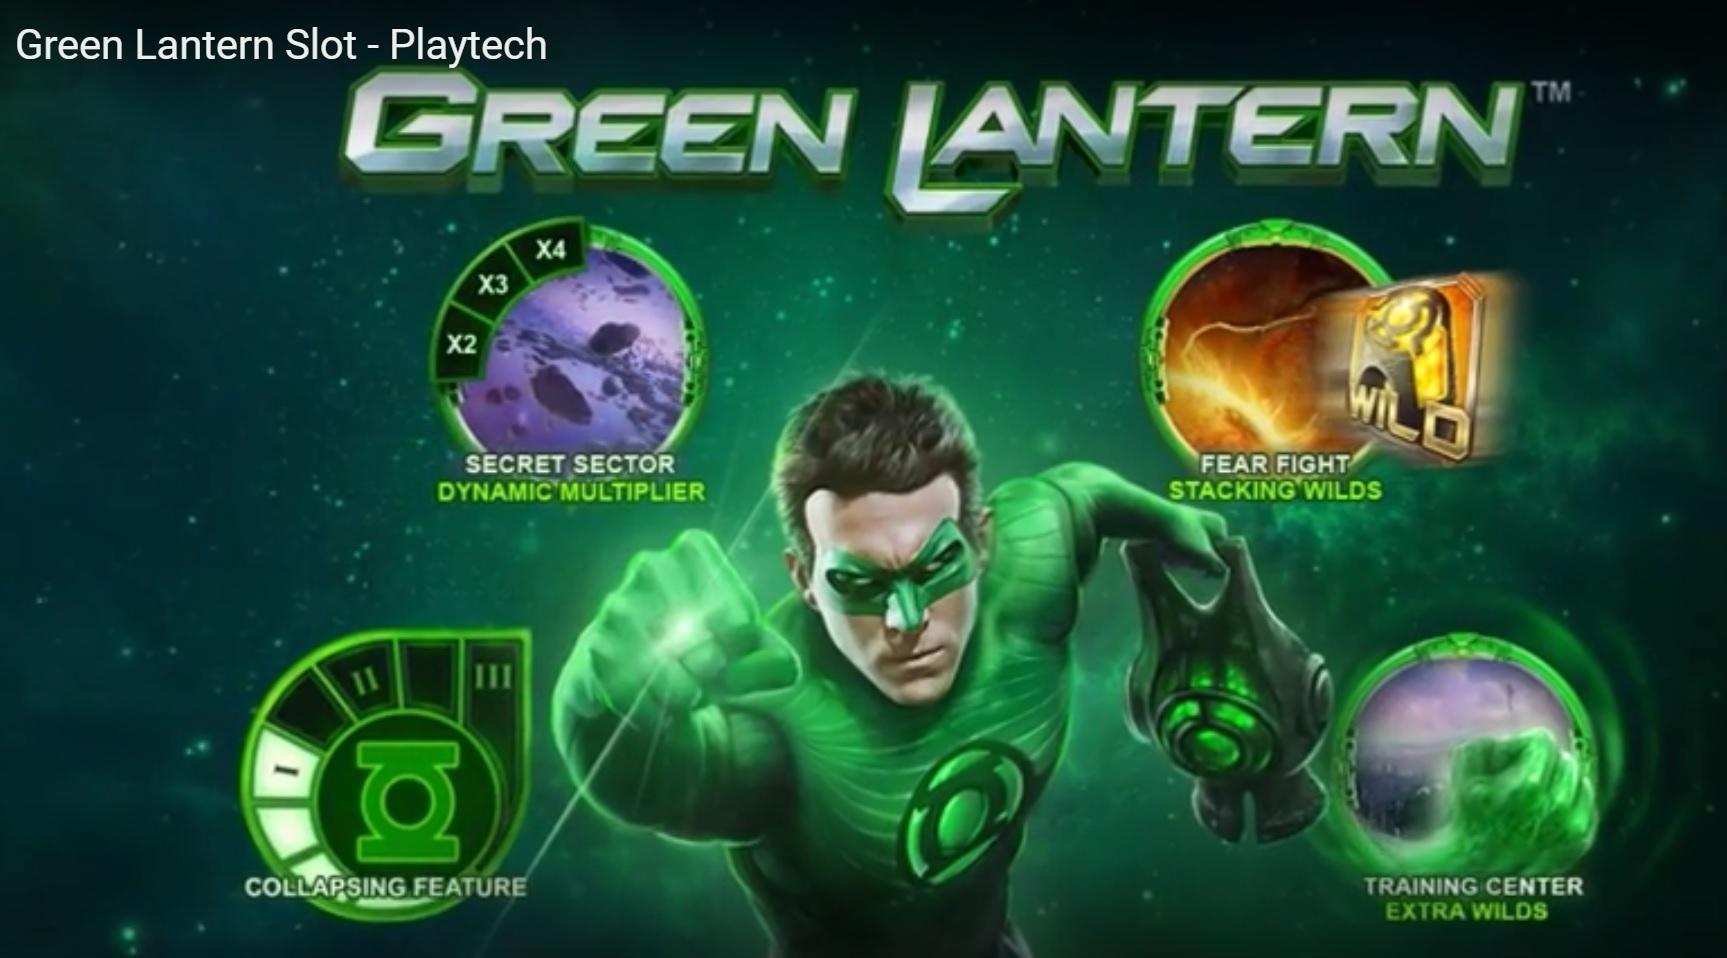 Green Lantern gokkast Playtech